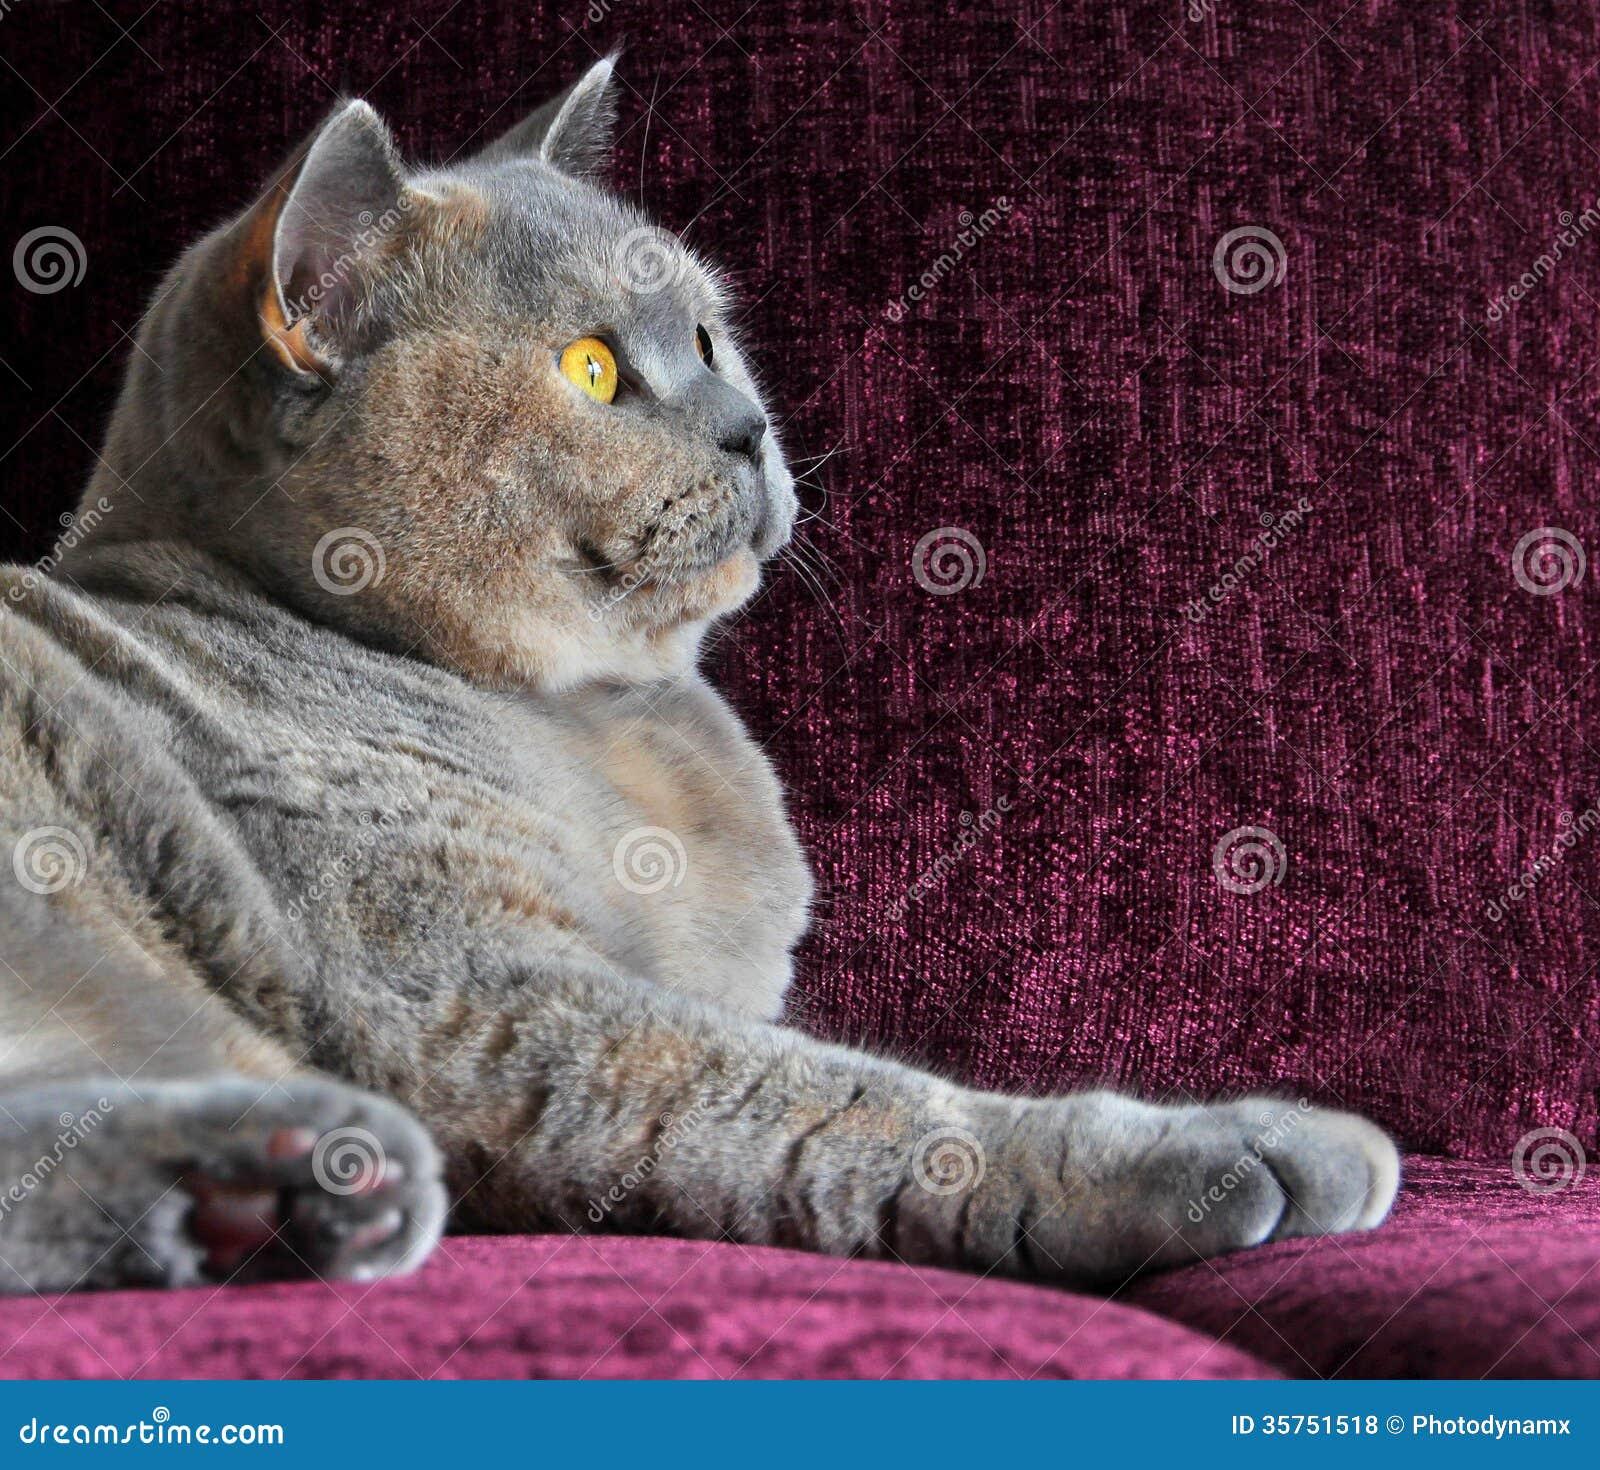 Luxury side profile cat on sofa